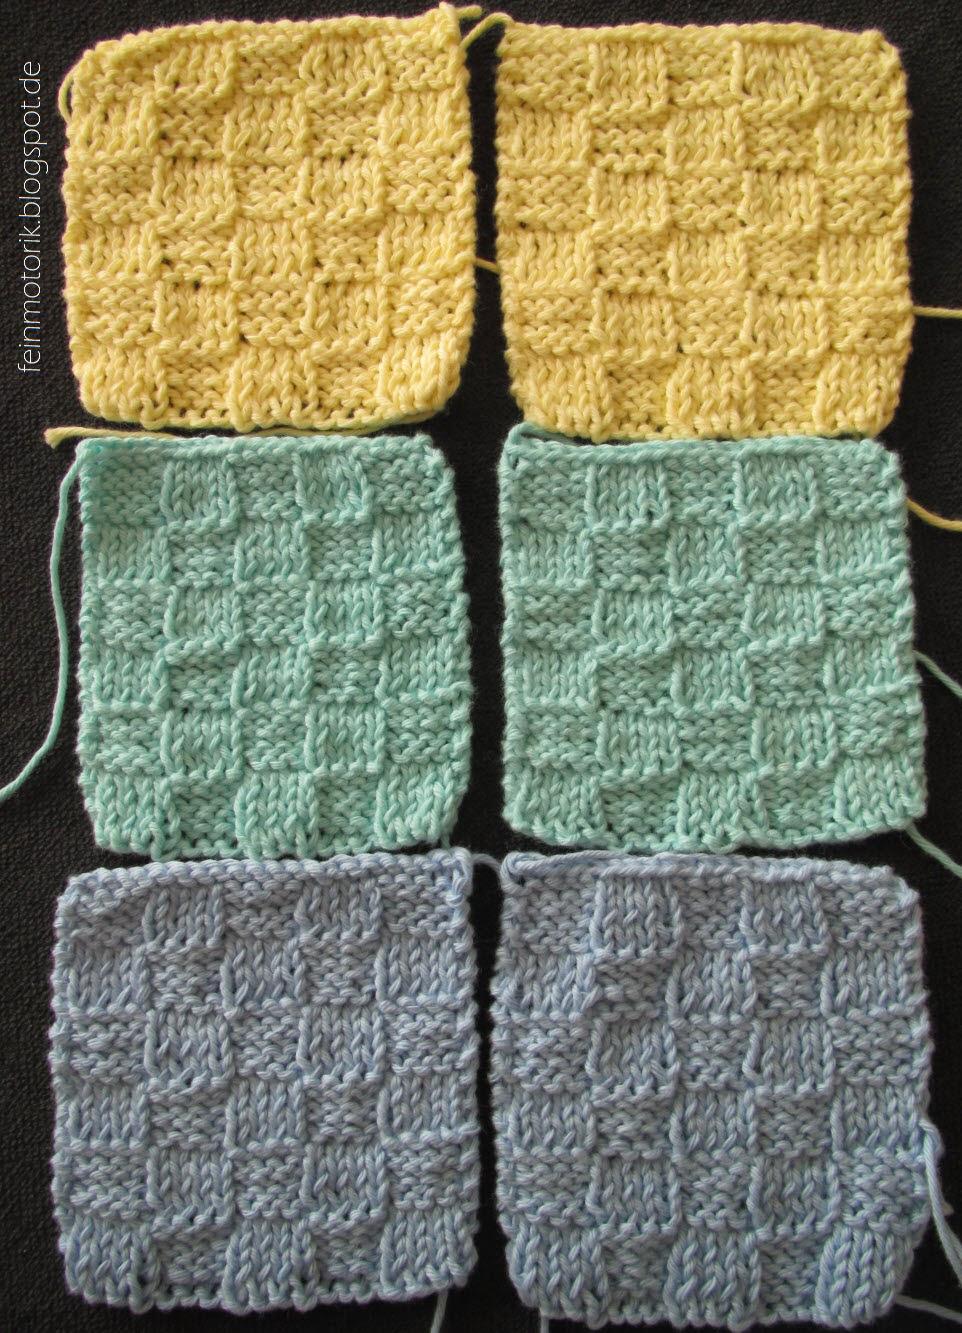 patchwork babydecke schachbrettmuster. Black Bedroom Furniture Sets. Home Design Ideas